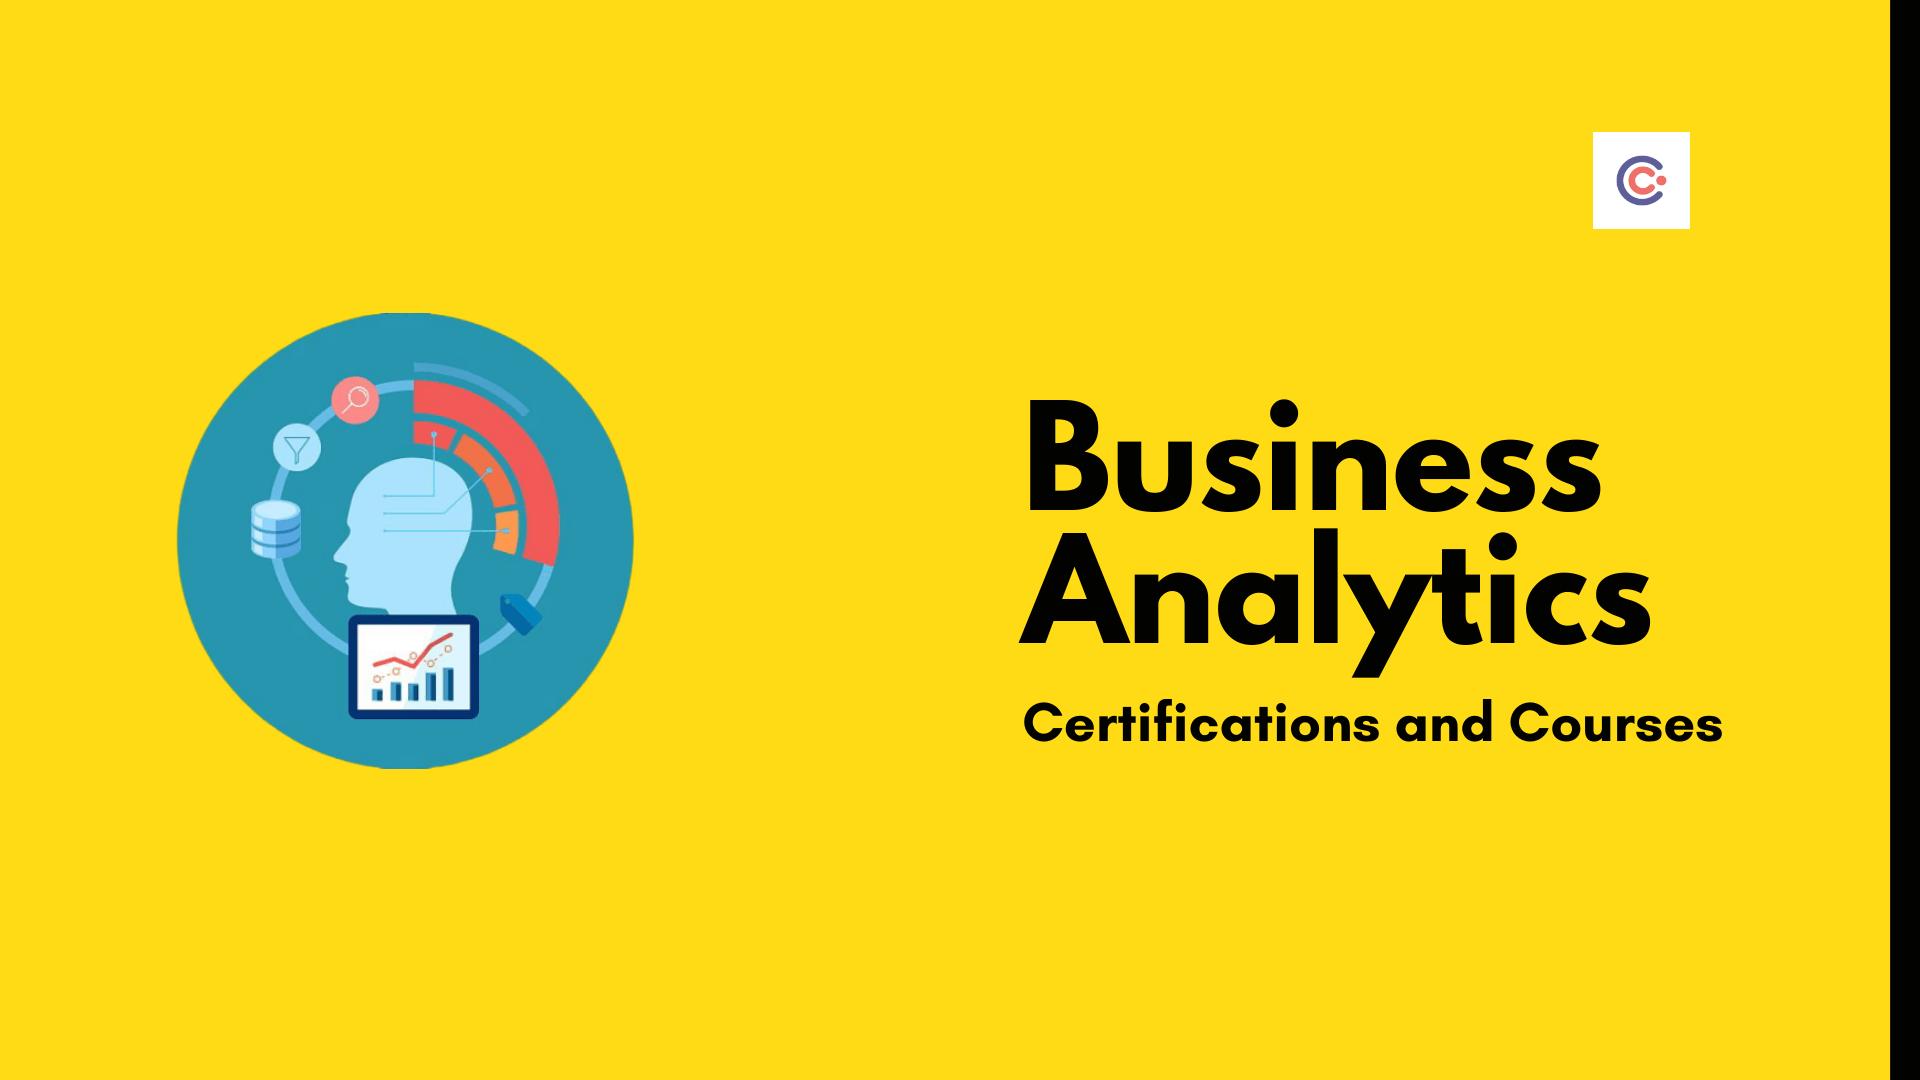 14 Best Business Analytics Certifications - 2021